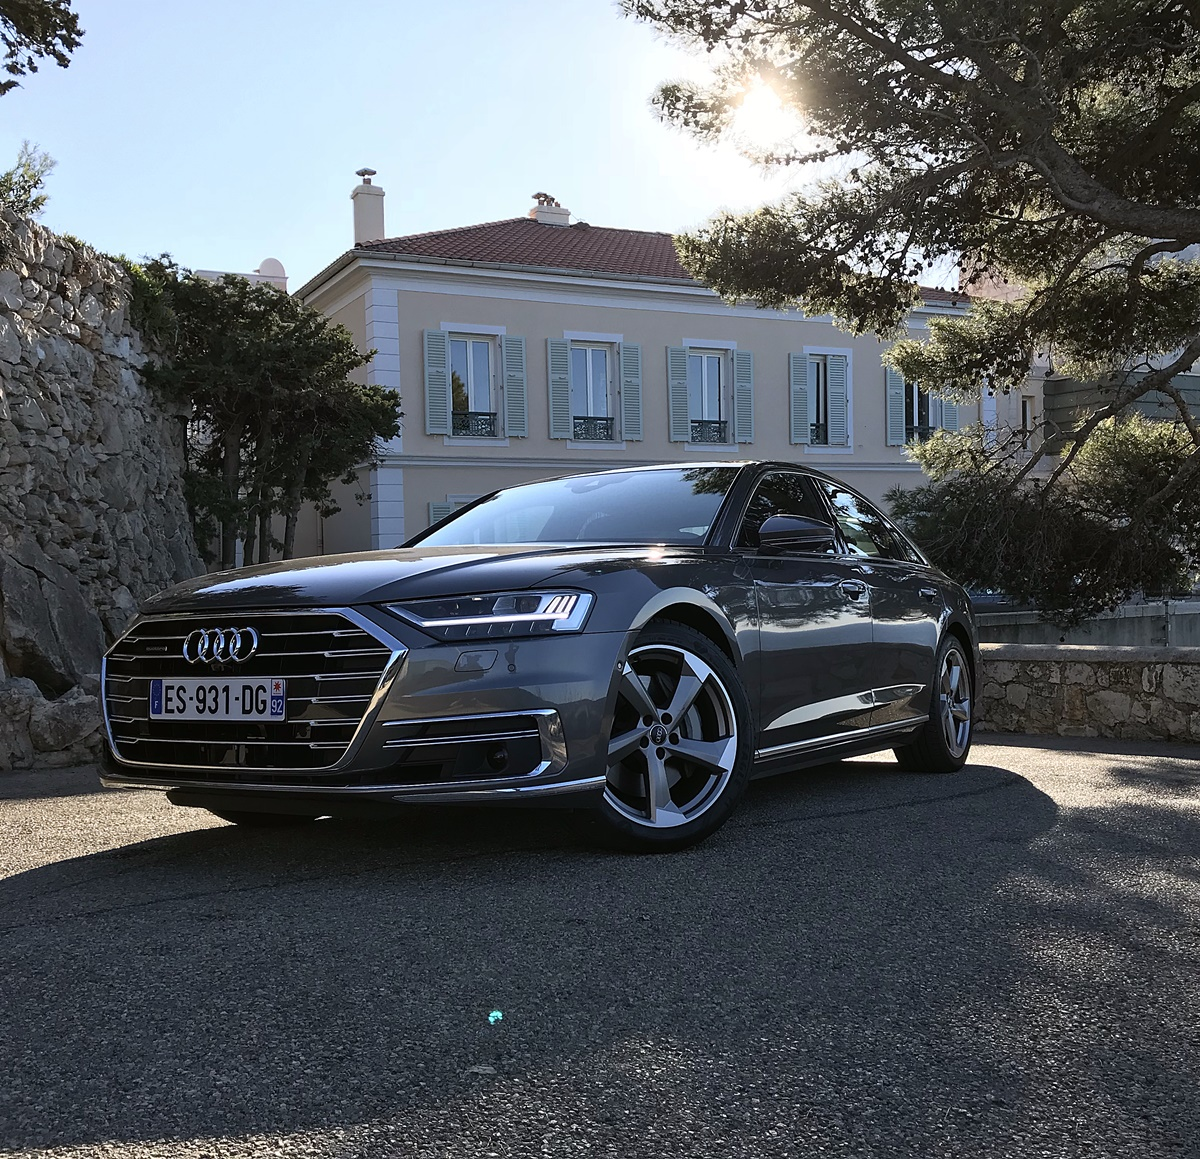 Audi A8 provence